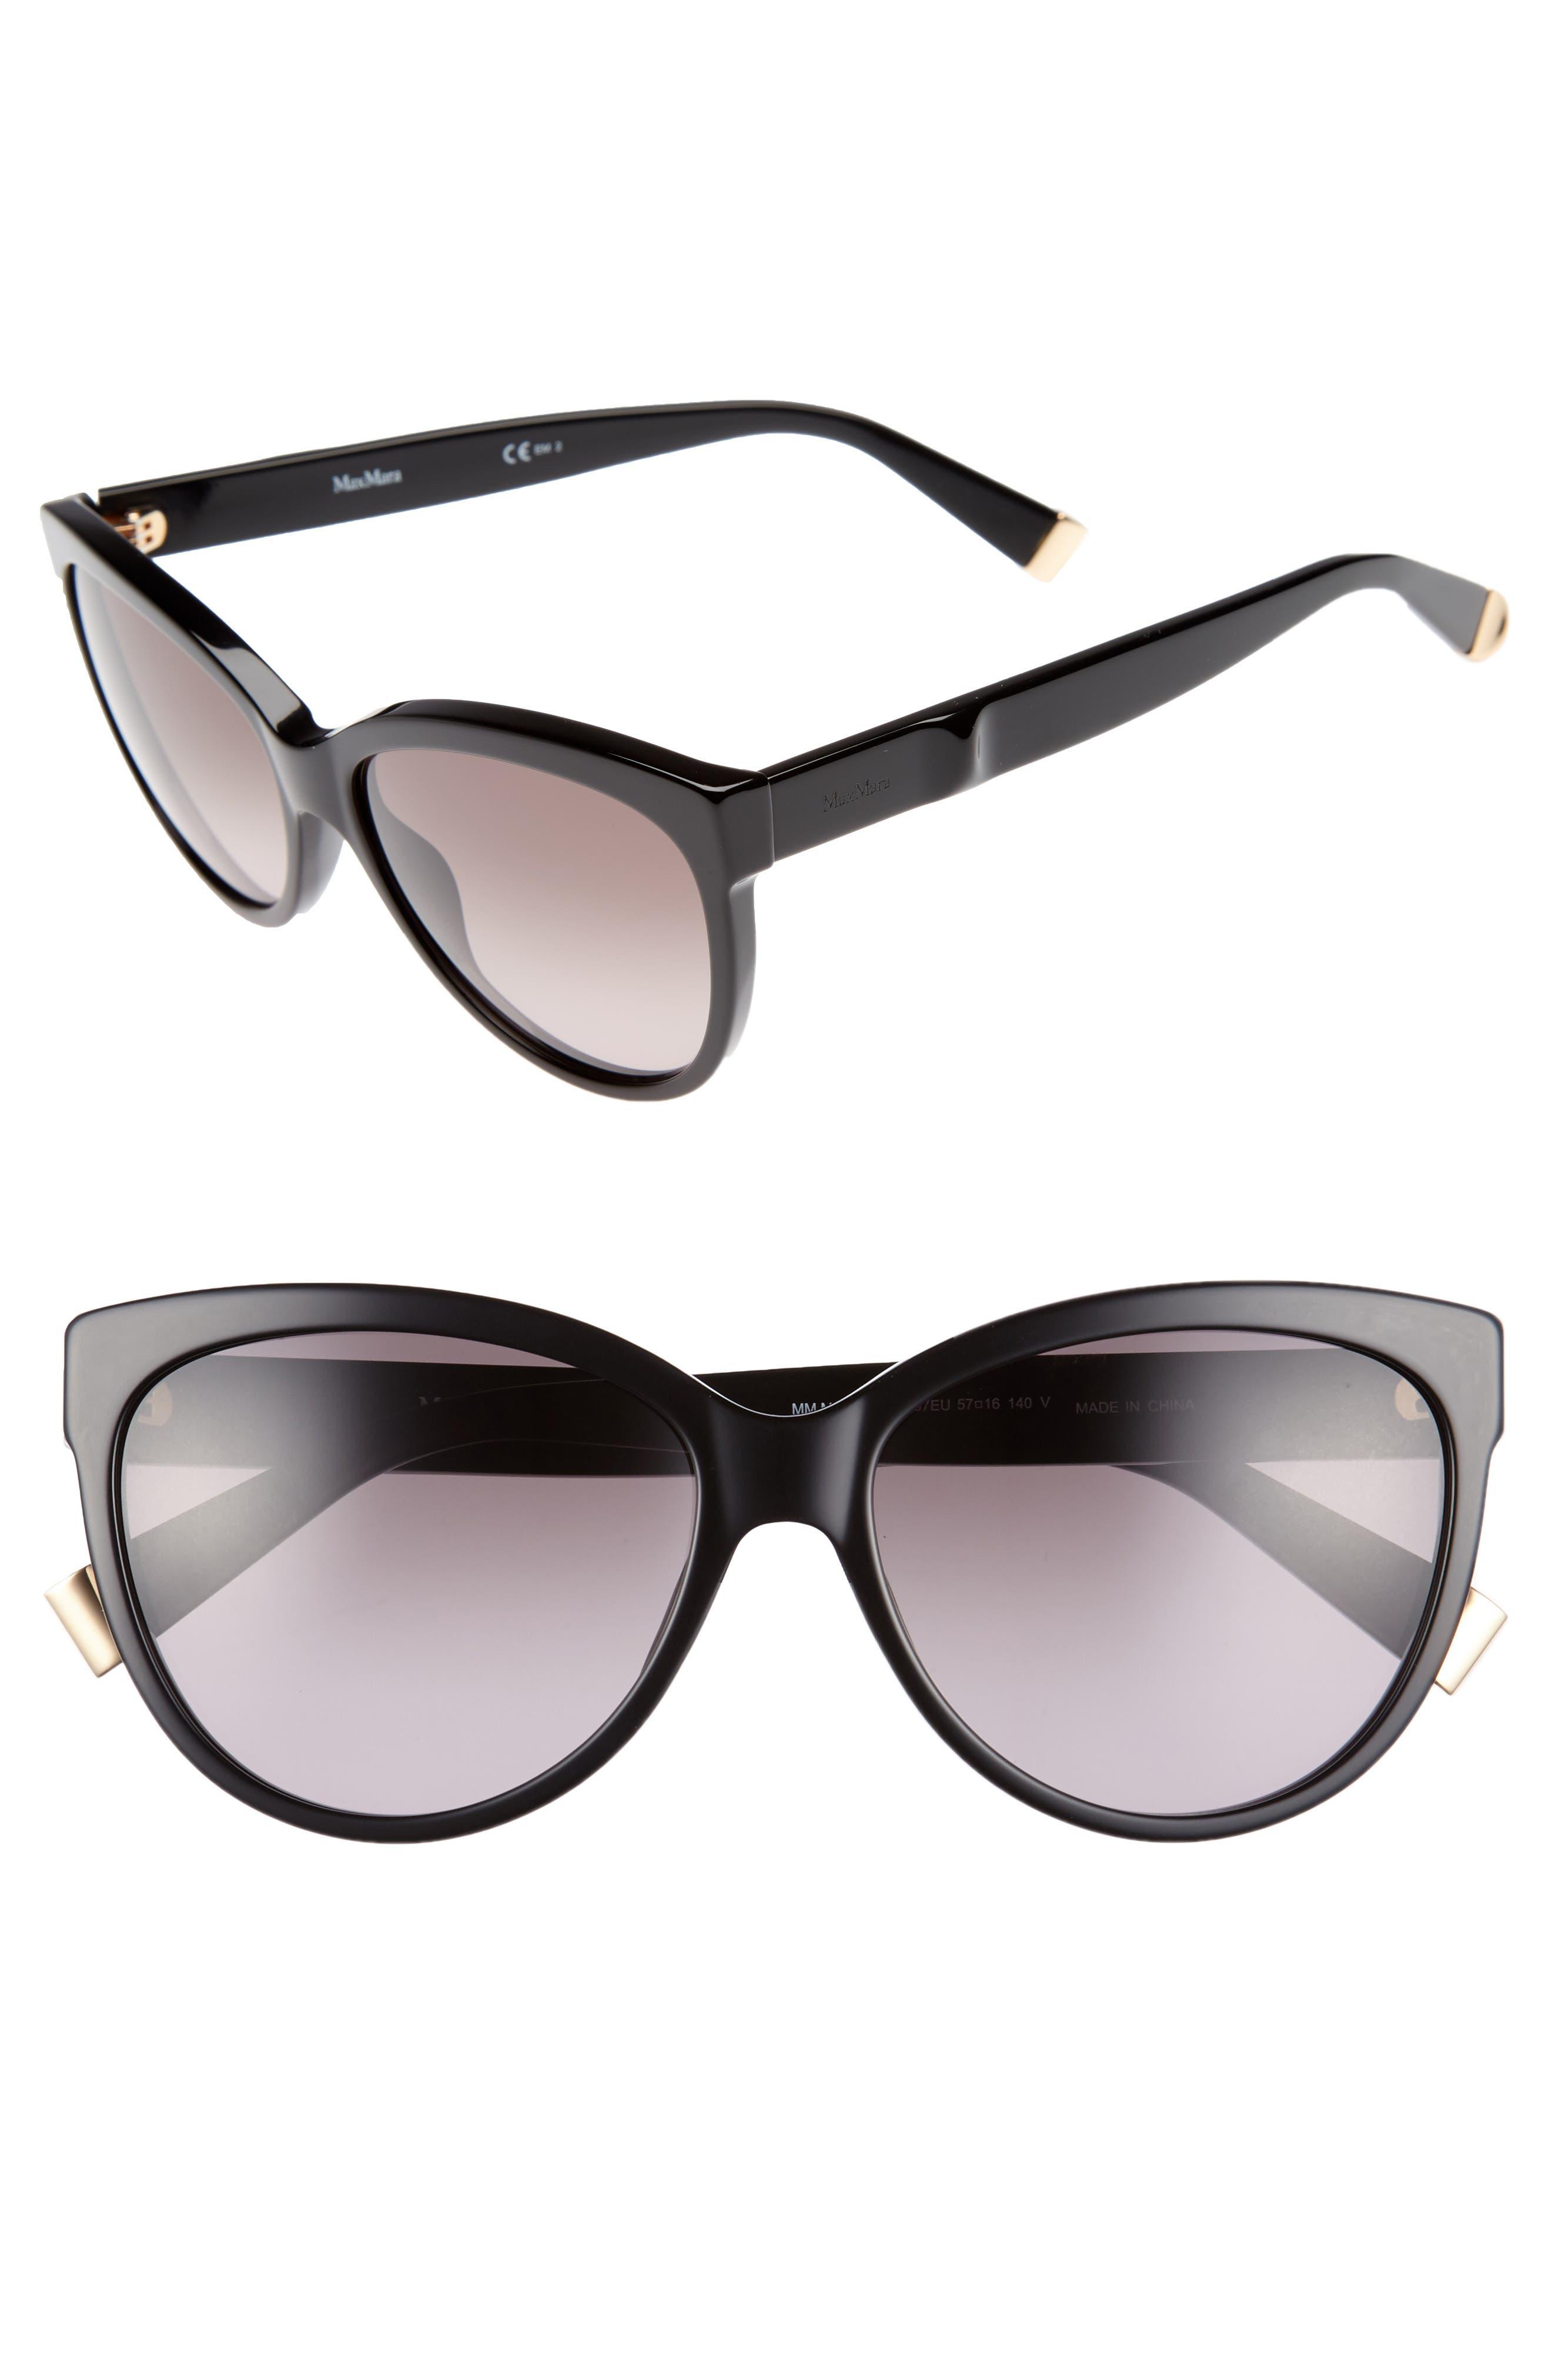 Moderii 57mm Gradient Cat Eye Sunglasses,                             Main thumbnail 1, color,                             001